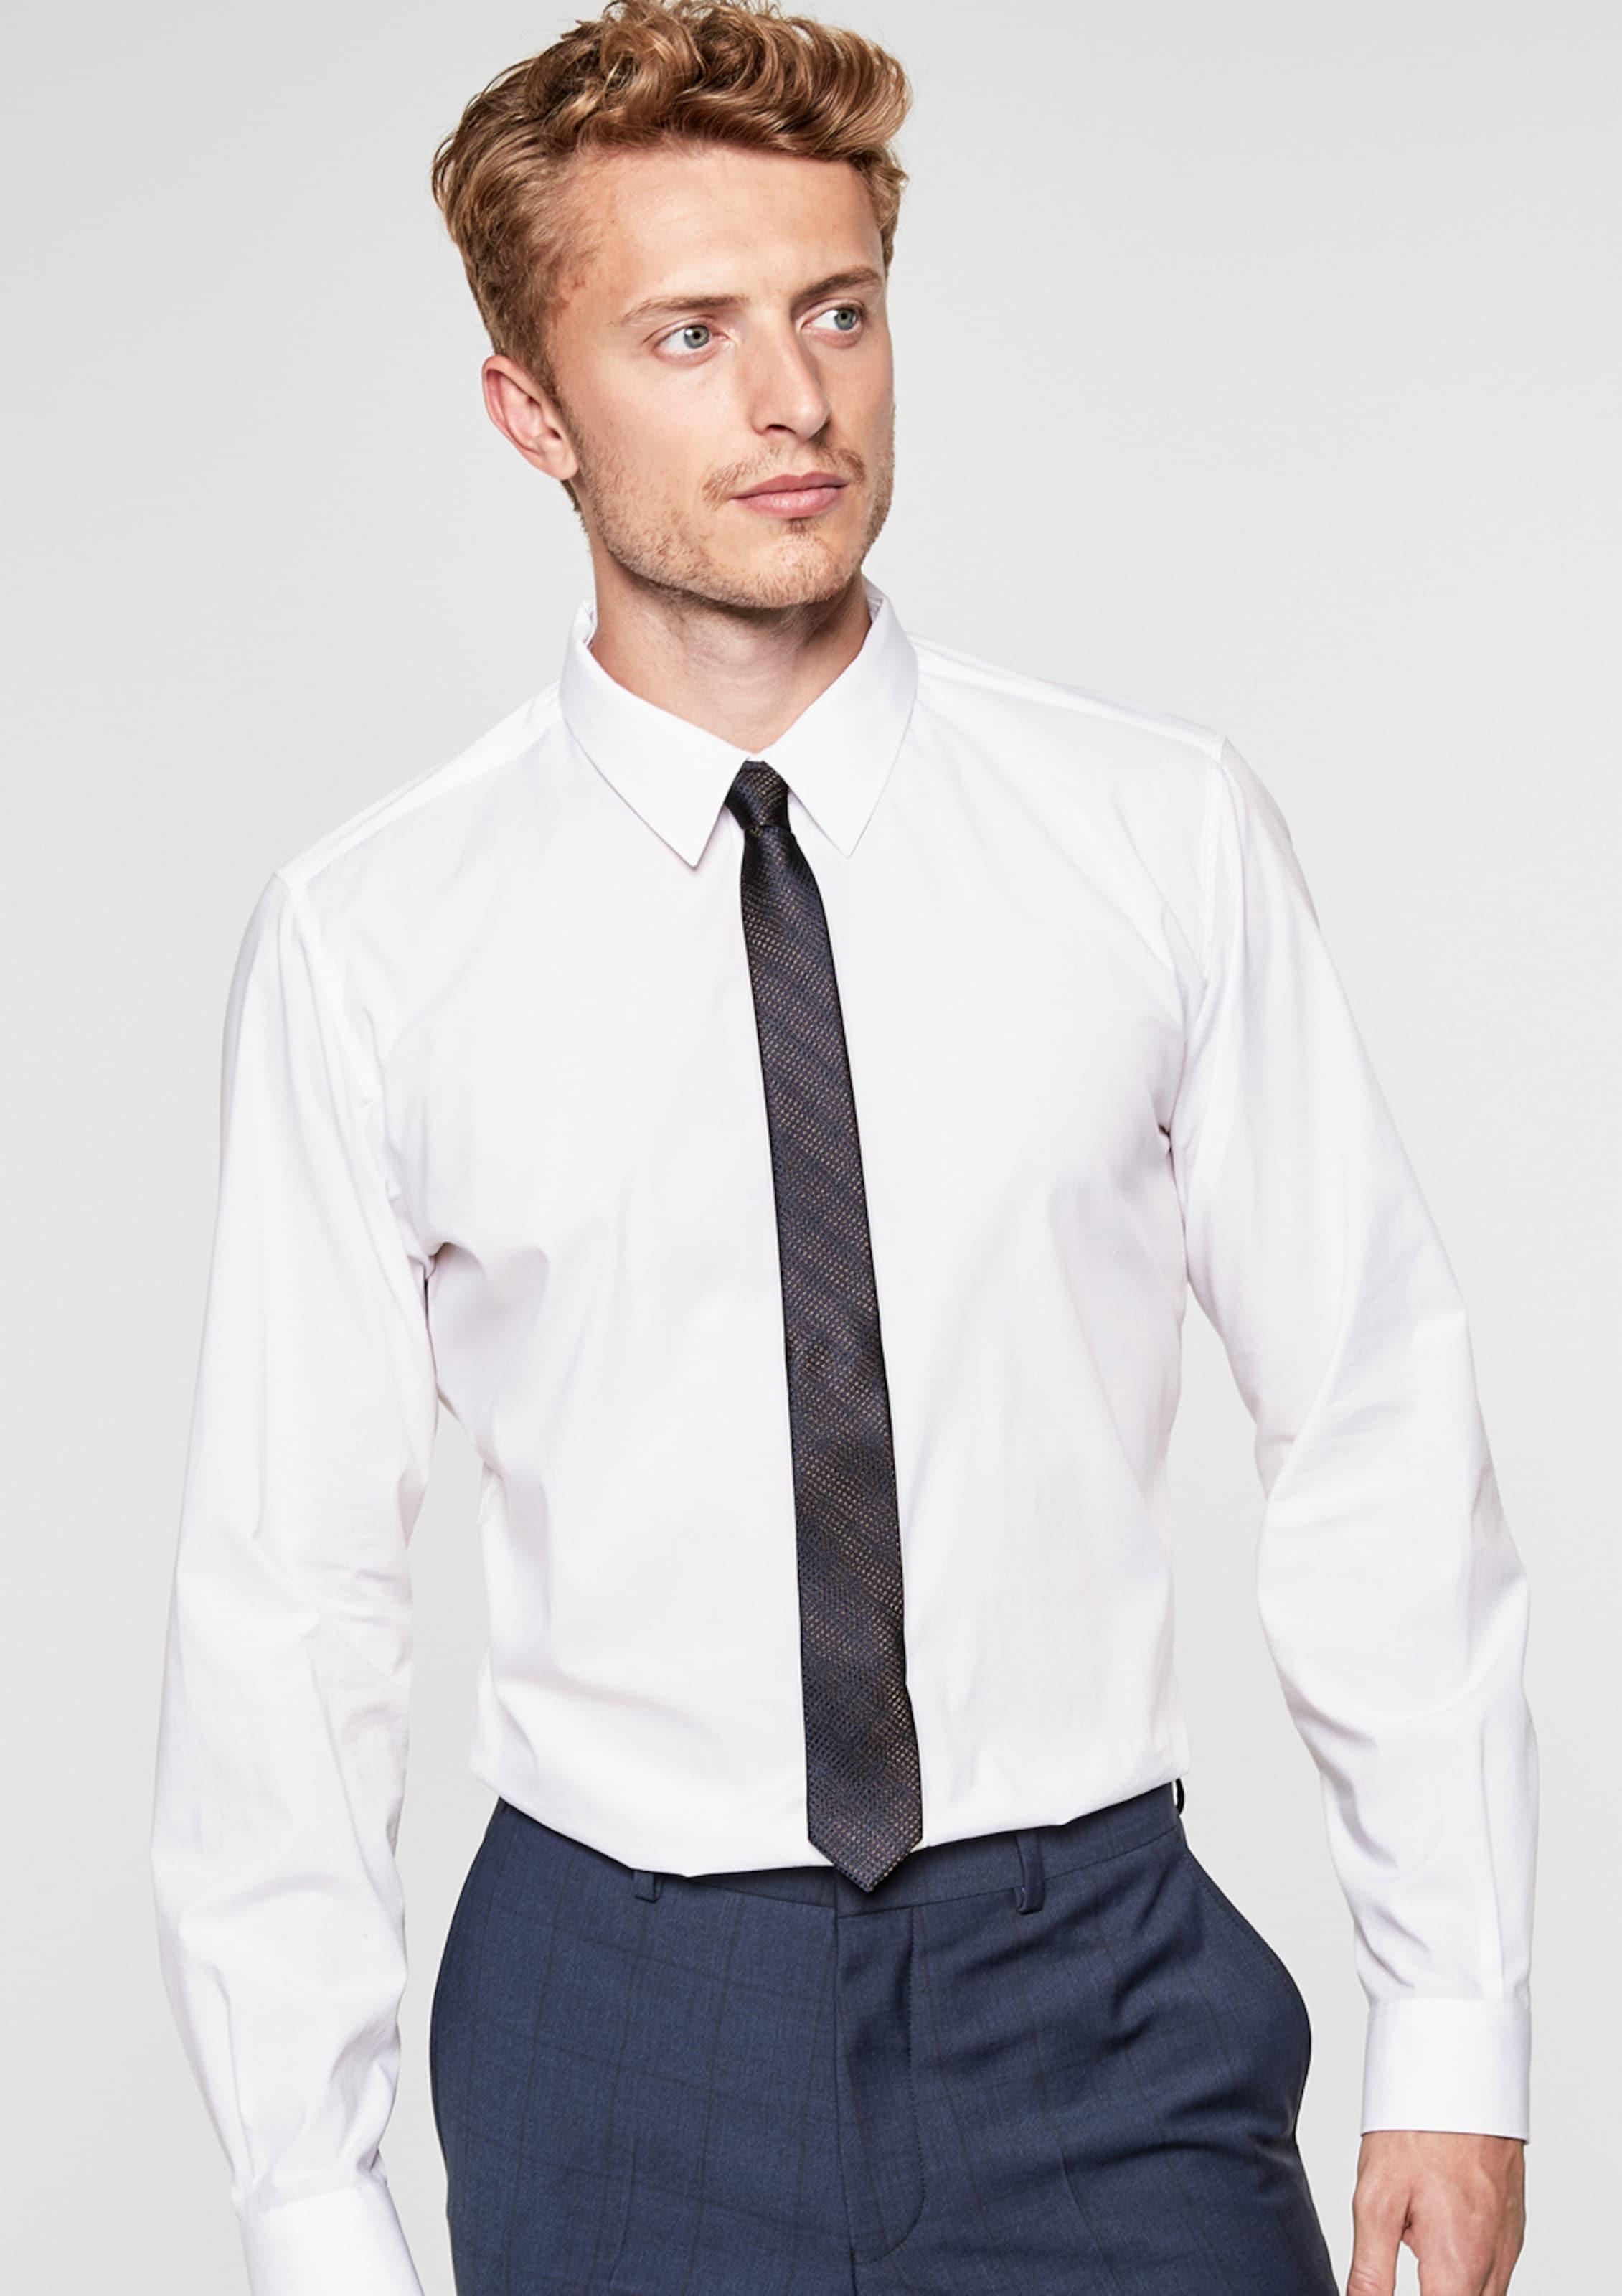 Krawatte oliver In Navy S Black Label 6f7gybYv